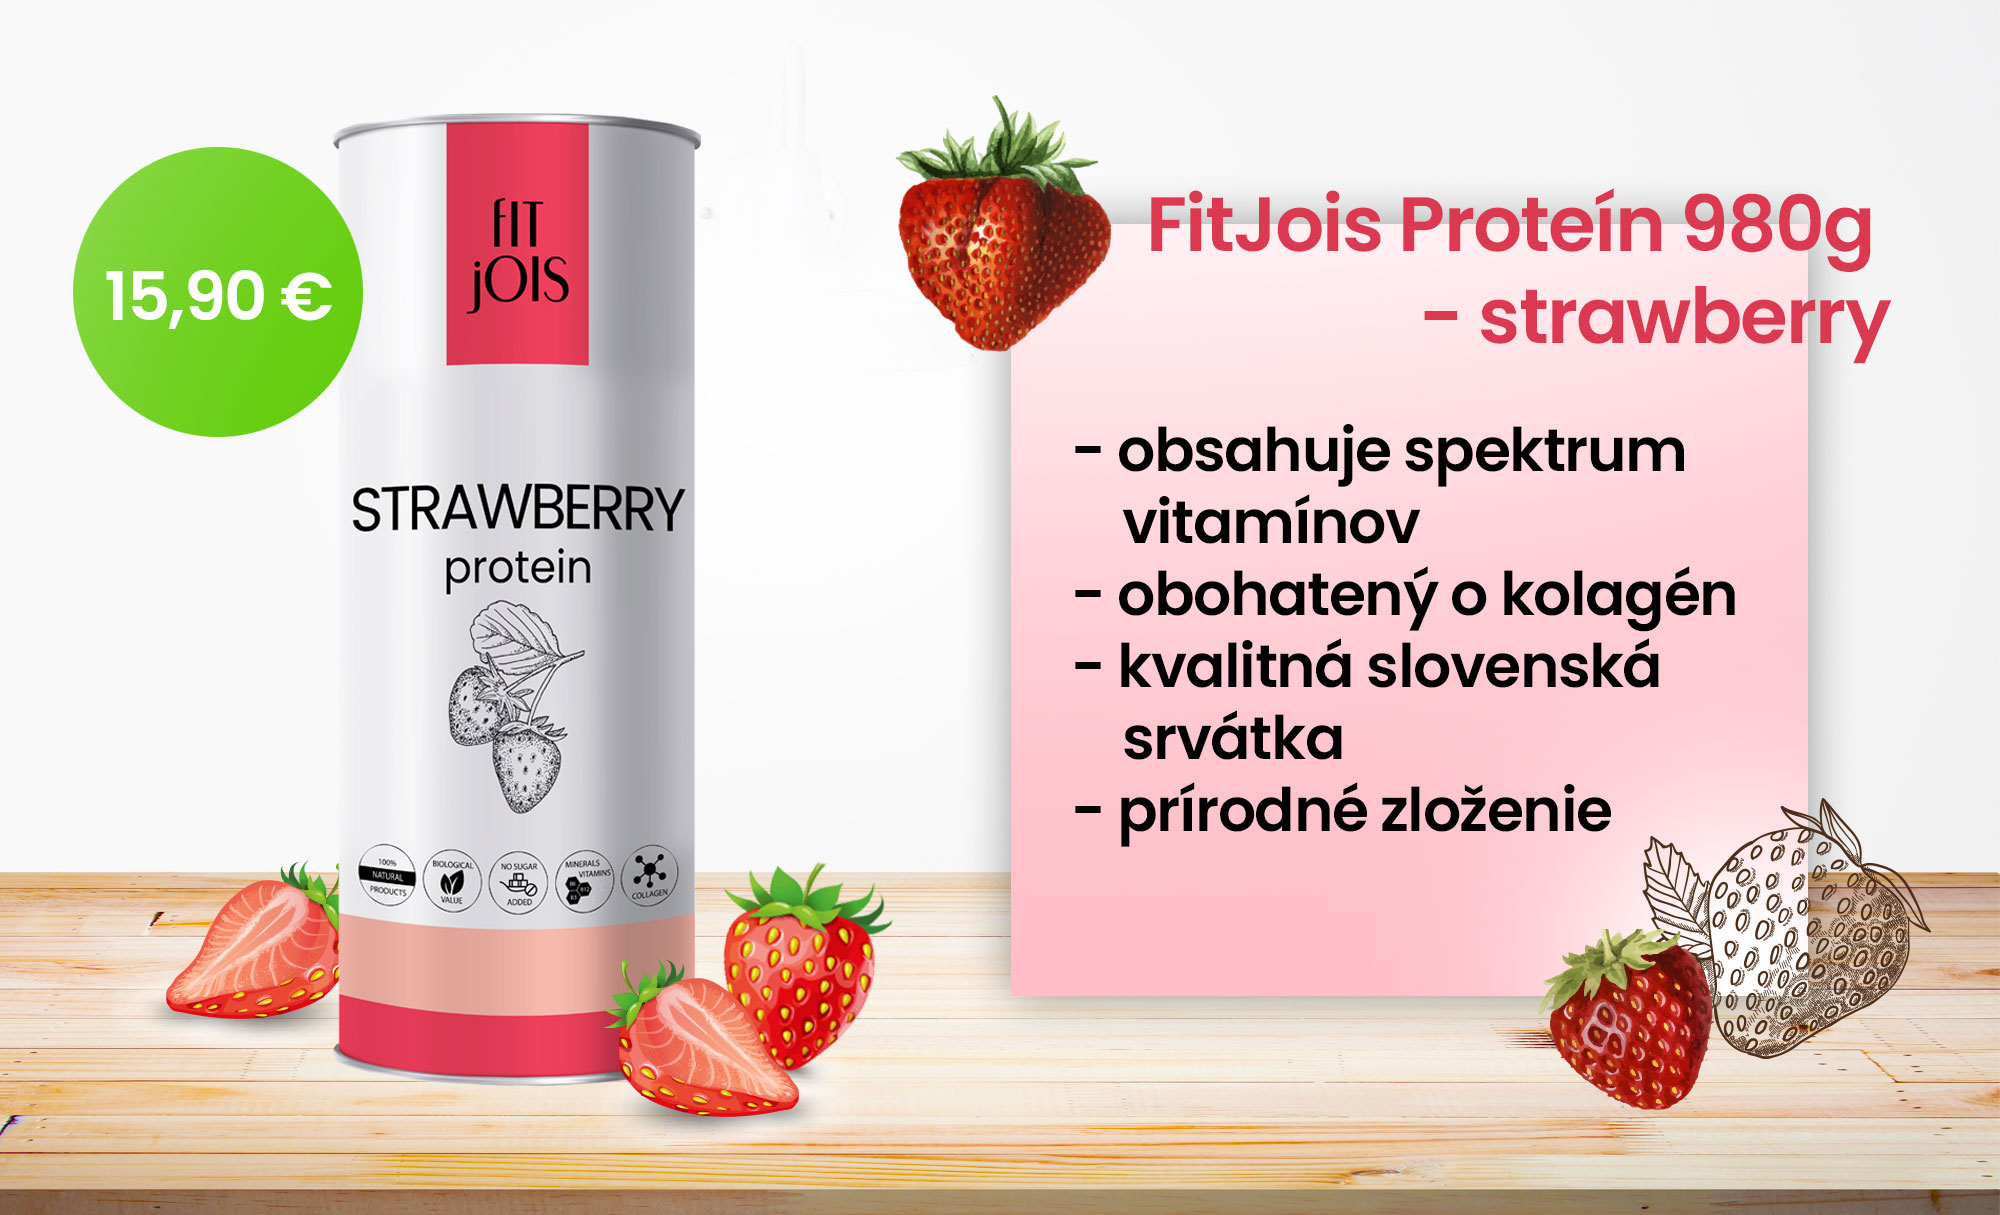 fitjois protein jahoda